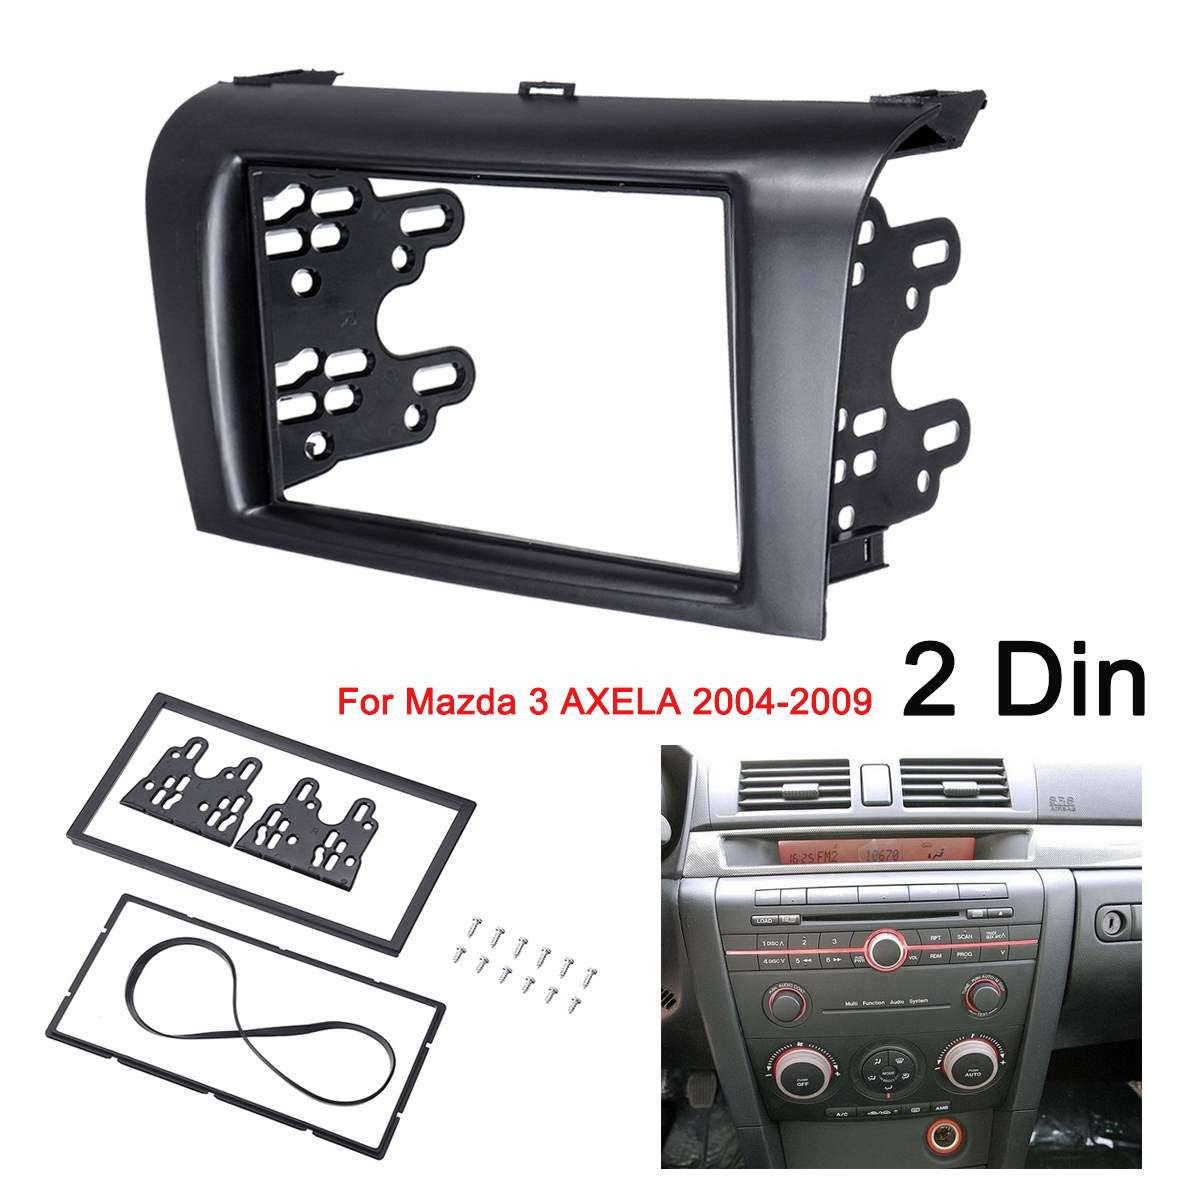 2DIN araba Stereo radyo DVD fasya Fascias Dash paneli plaka Trim kiti krom çerçeve için Mazda 3 AXELA 2004 2005 2006 2007 2008 2009